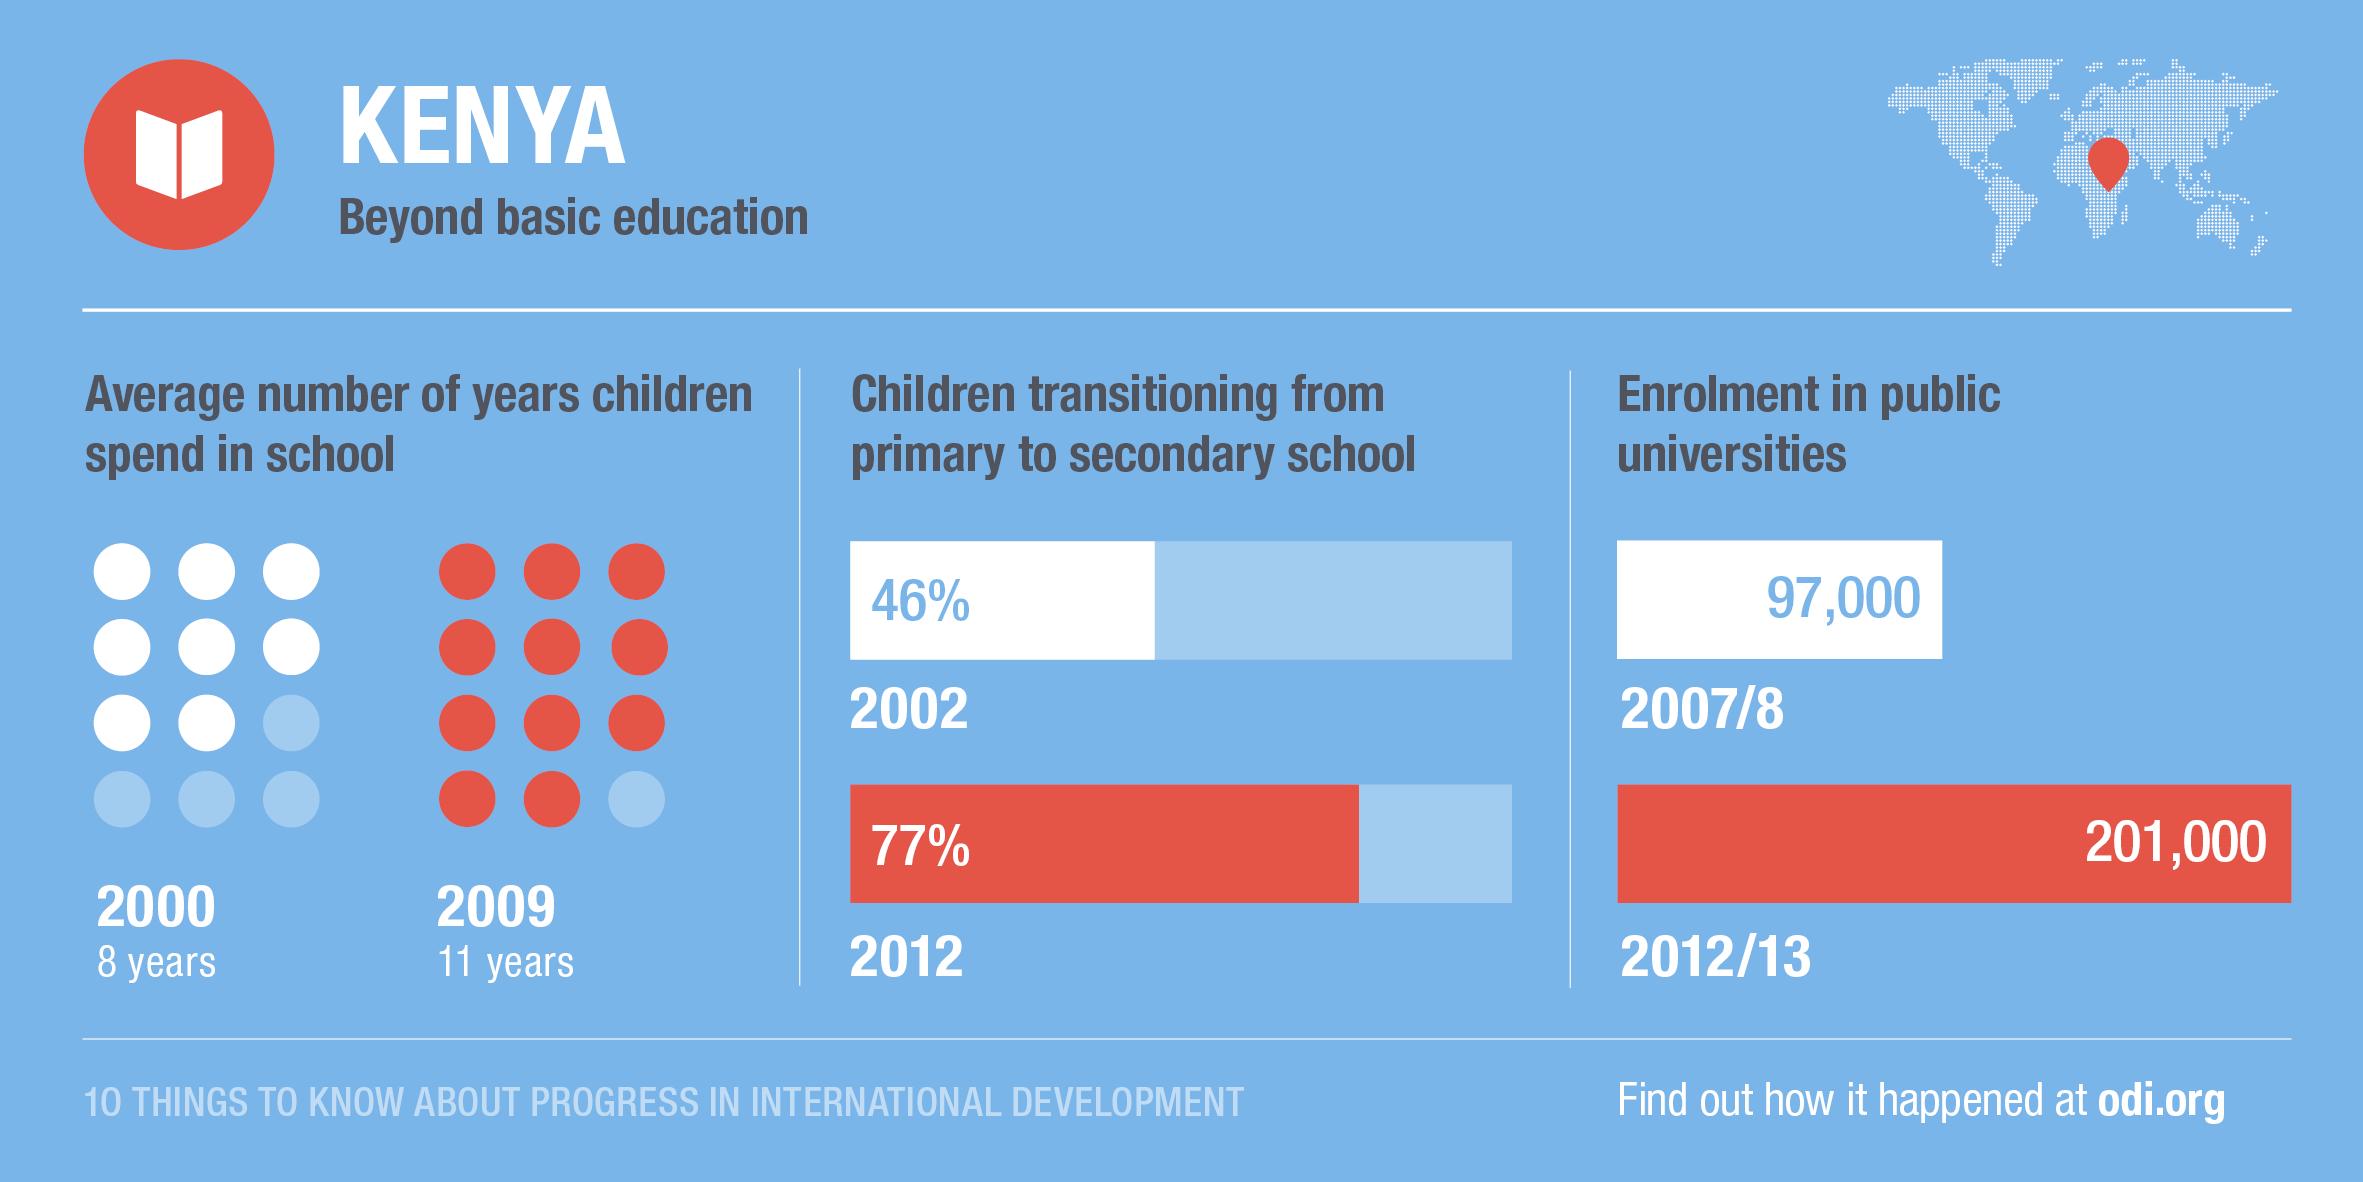 Kenya's progress on education